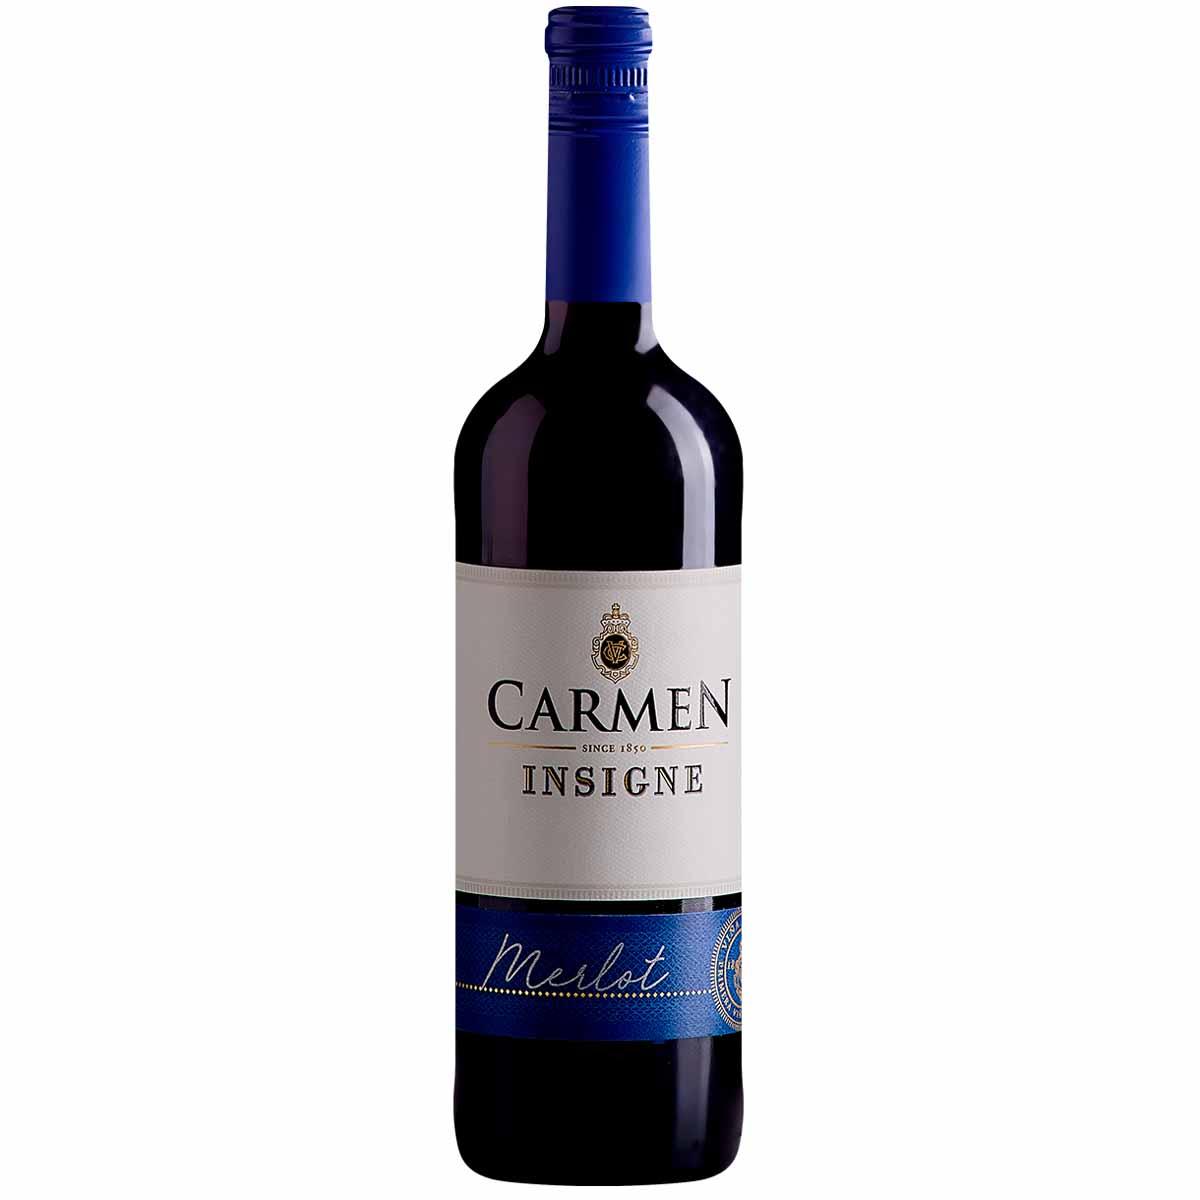 Vinho Tinto Chileno Carmen Insigne Merlot 2018 750ml